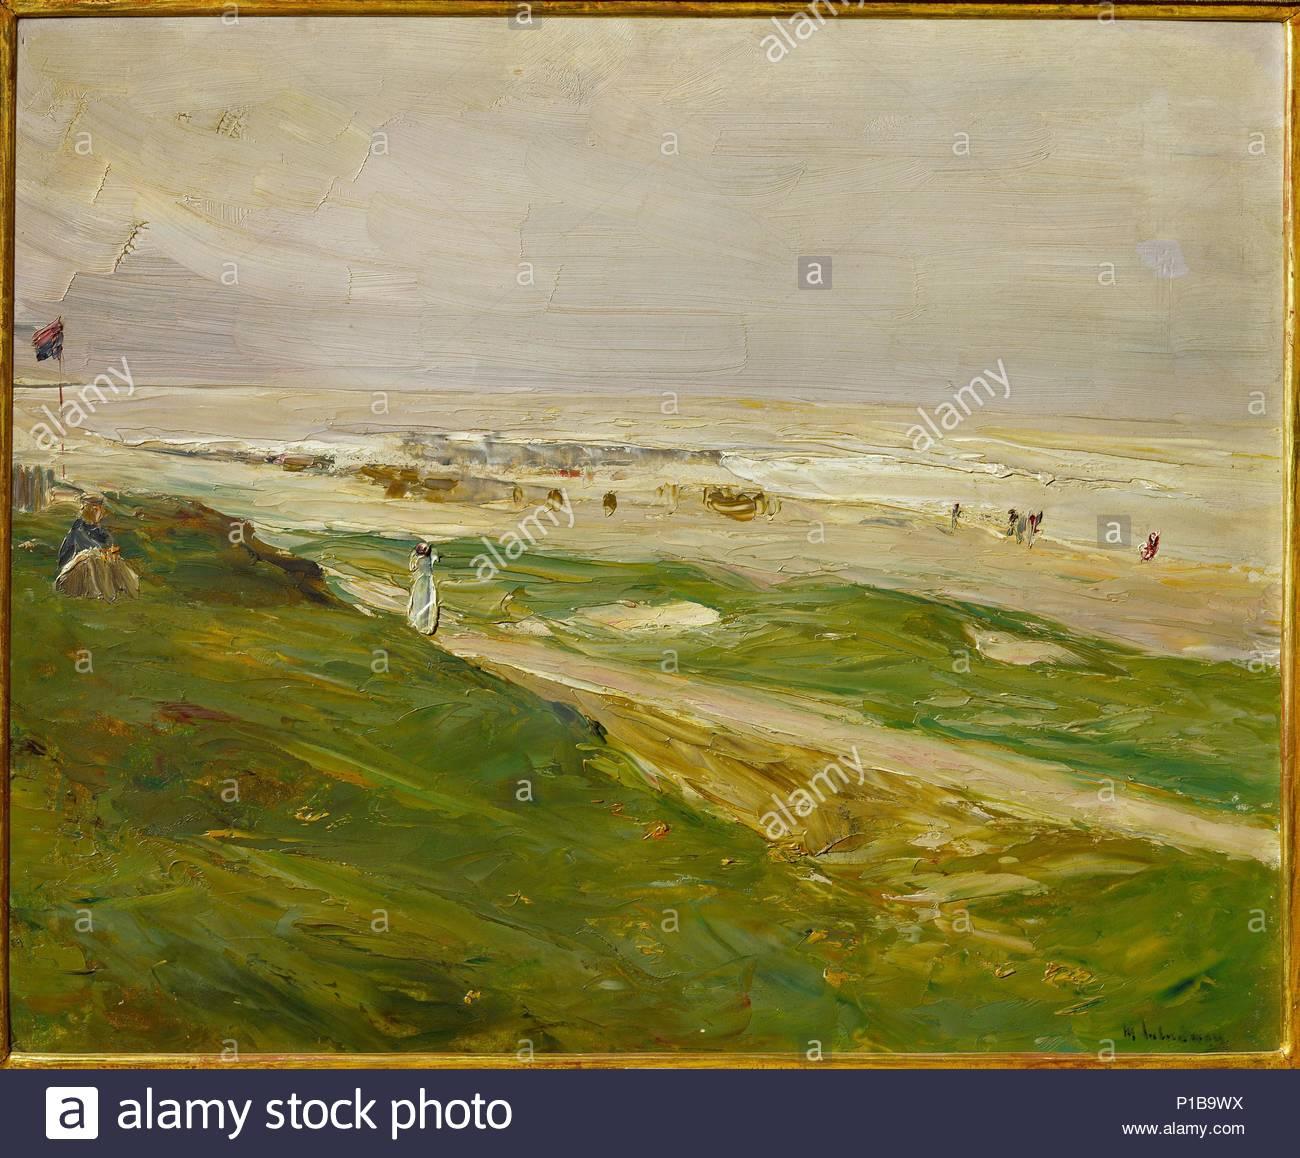 Dune in Noordwijk, Netherlands,1908 Cardboard, 37 x 46 cm Inv. B 74.702. Author: Max Liebermann (1847-1935). Location: Israel Museum, Jerusalem, Israel. - Stock Image